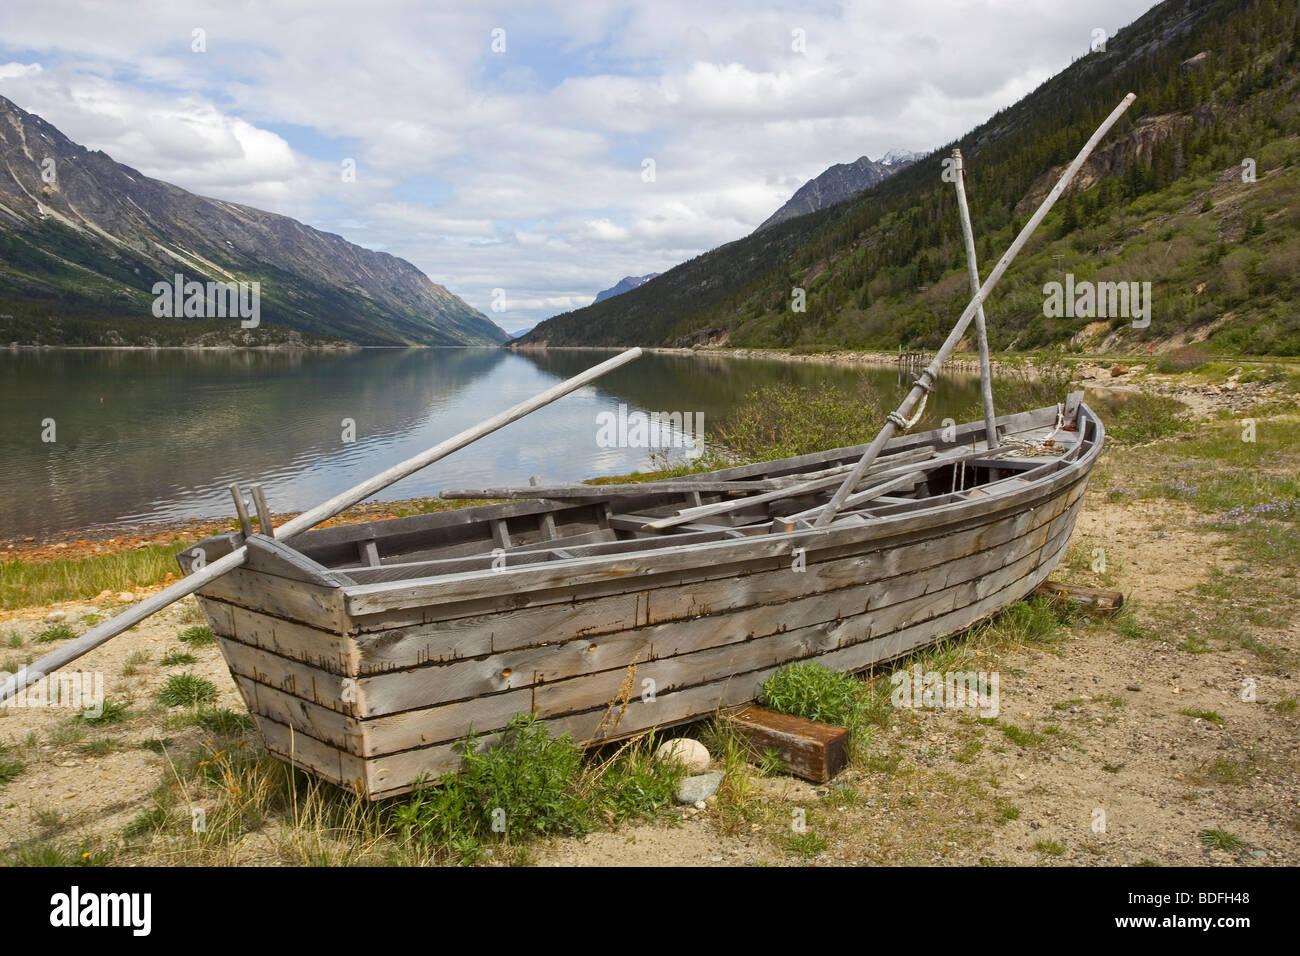 Rué vers l'or, la barque des Yukonners ! Historische-holzerne-boot-am-ufer-des-lake-bennett-bennett-klondike-gold-rush-chilkoot-pass-chilkoot-trail-yukon-territory-bri-bdfh48